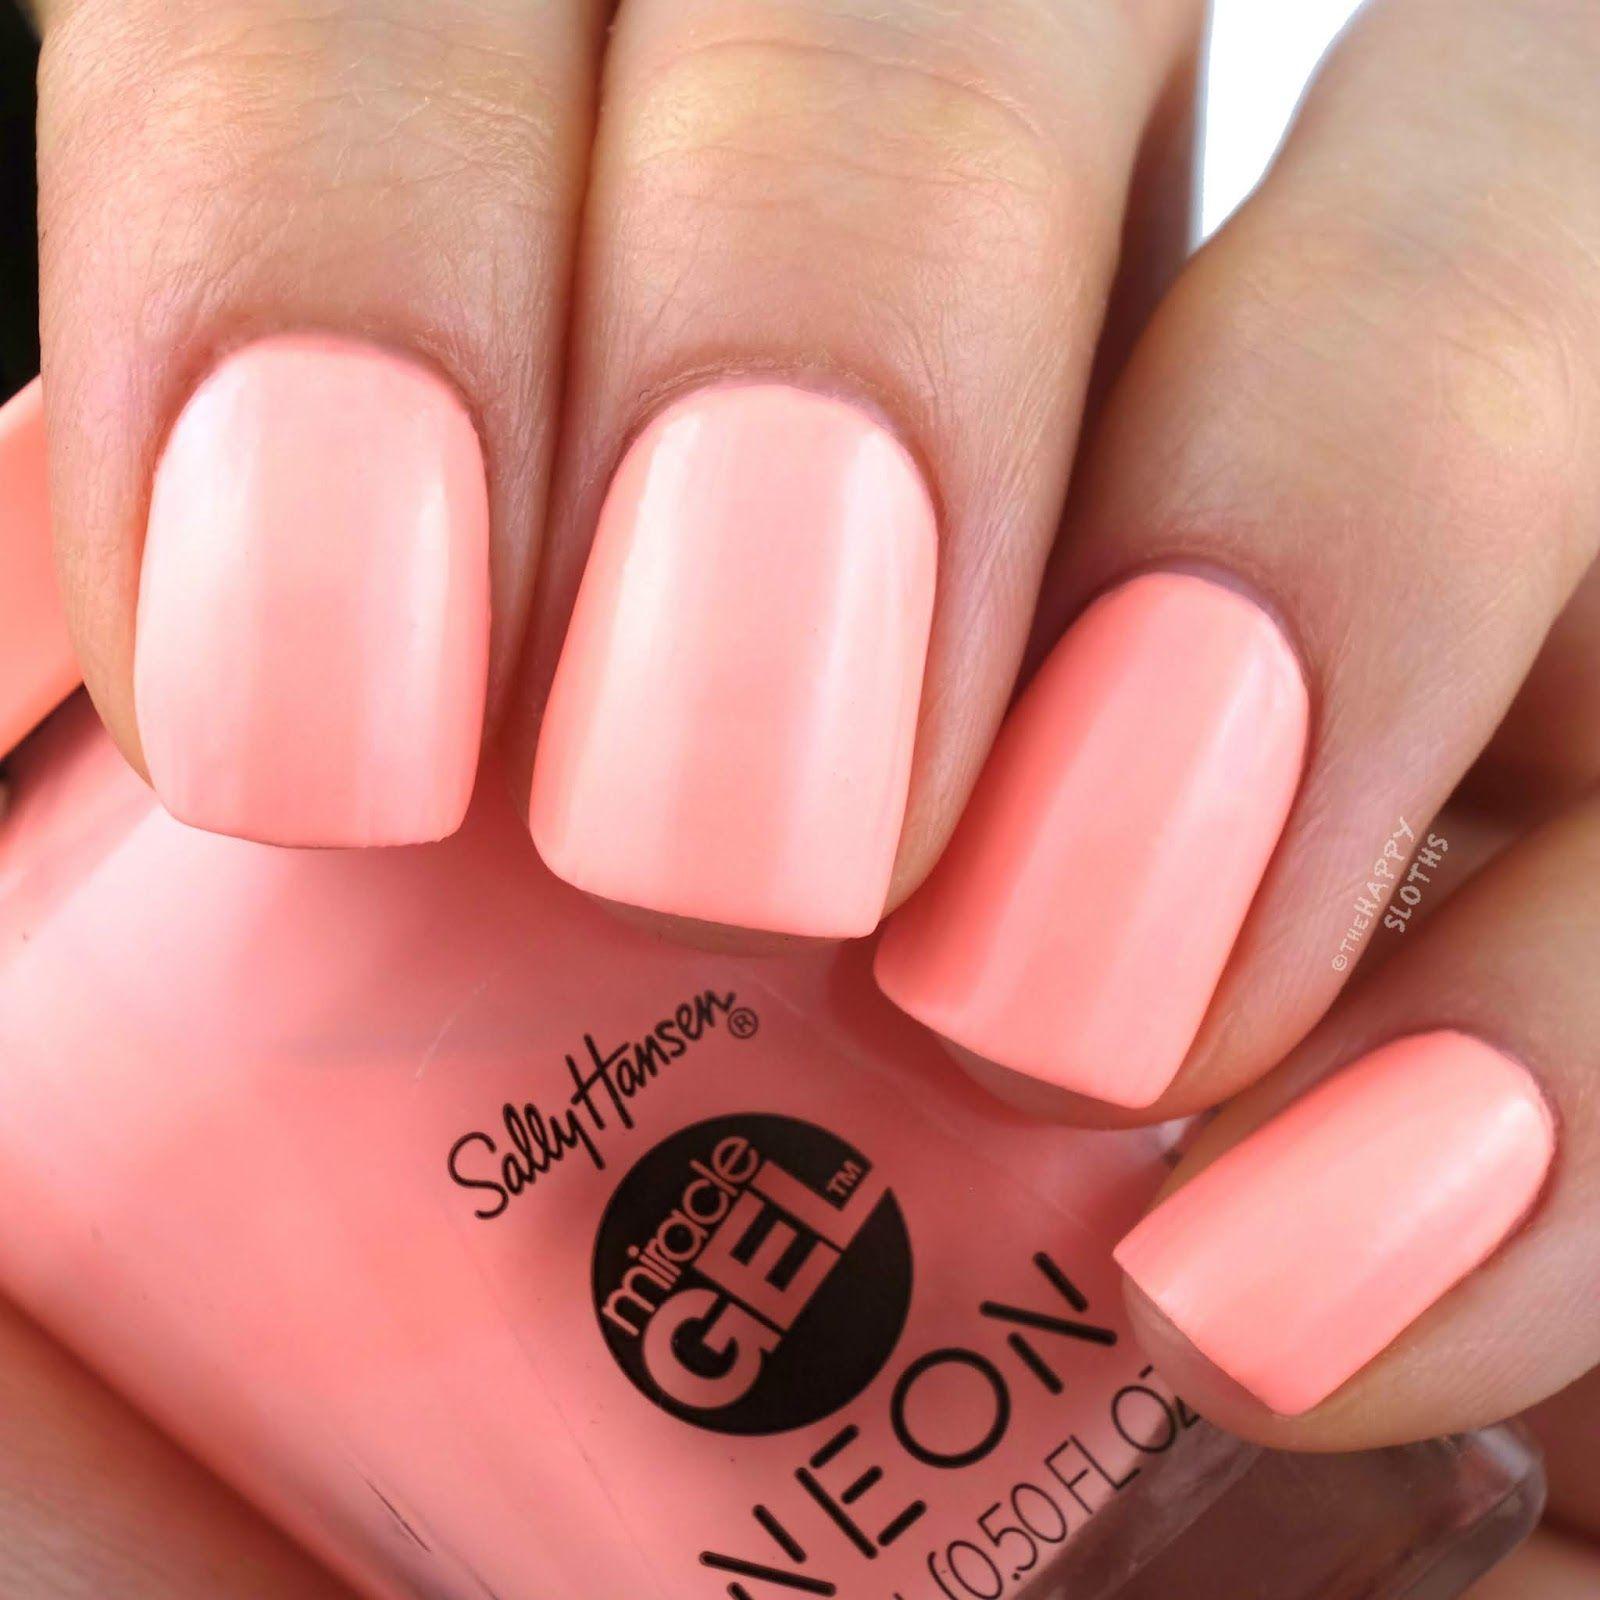 Sally Hansen Sally Hansen Miracle Gel Peach Nails Gel Polish